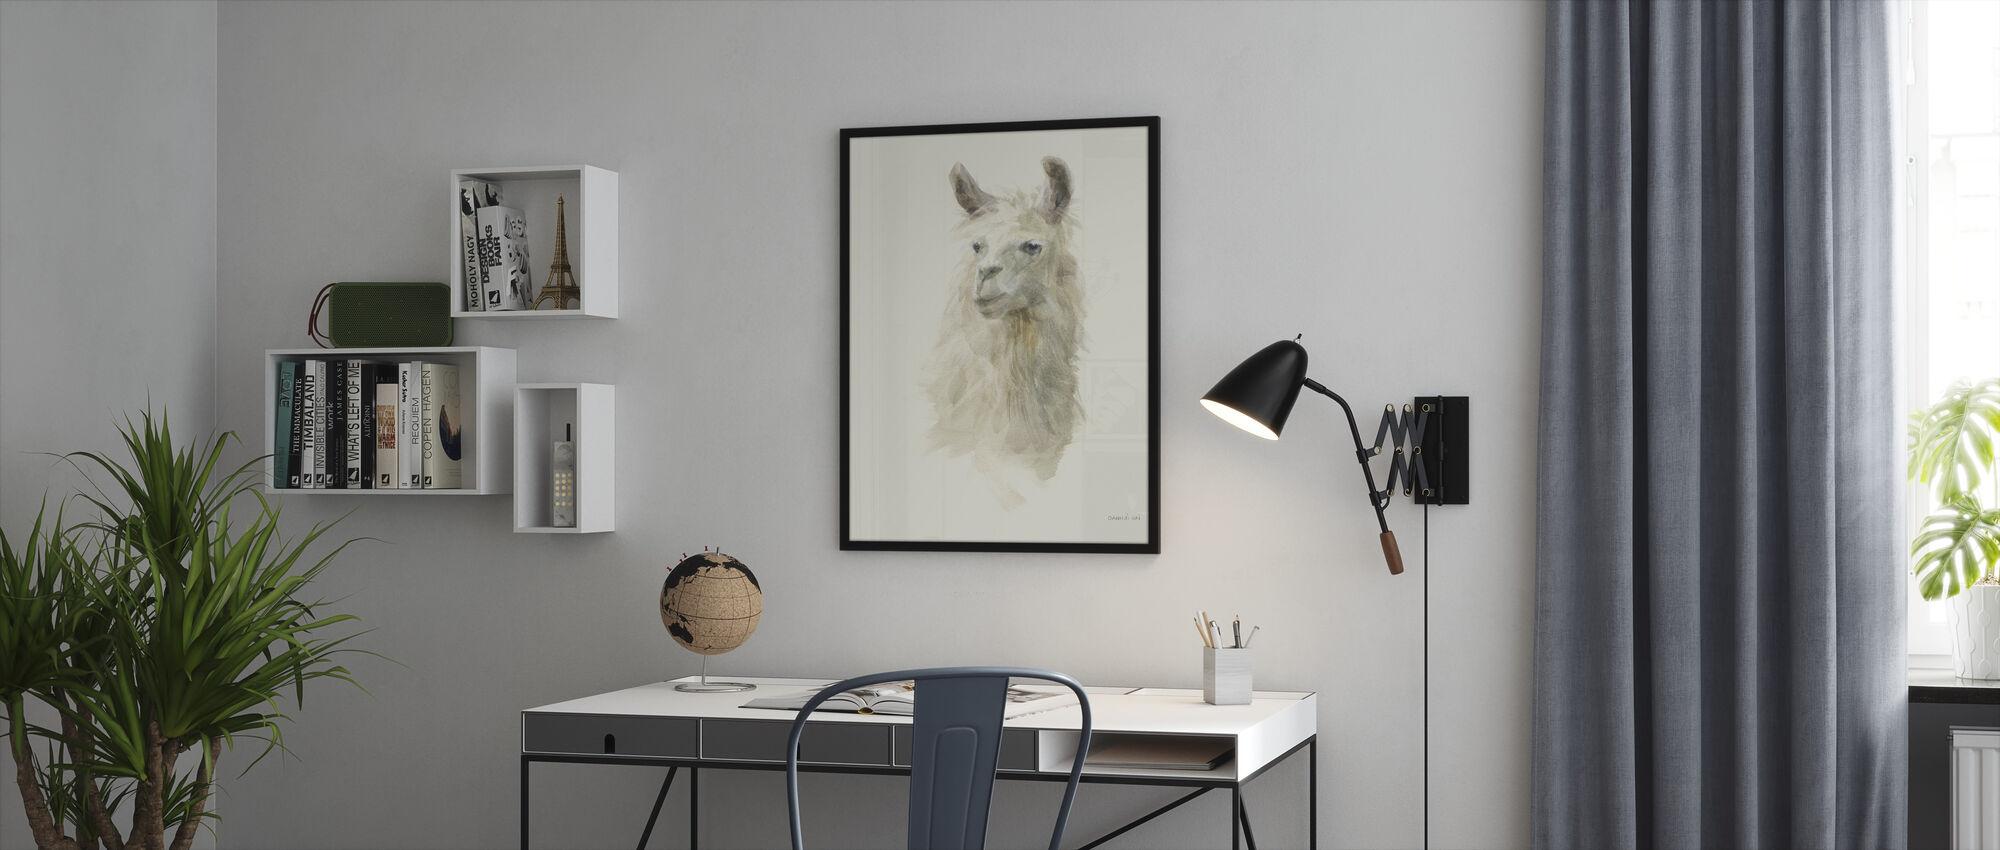 Classic Llamas II - Framed print - Office